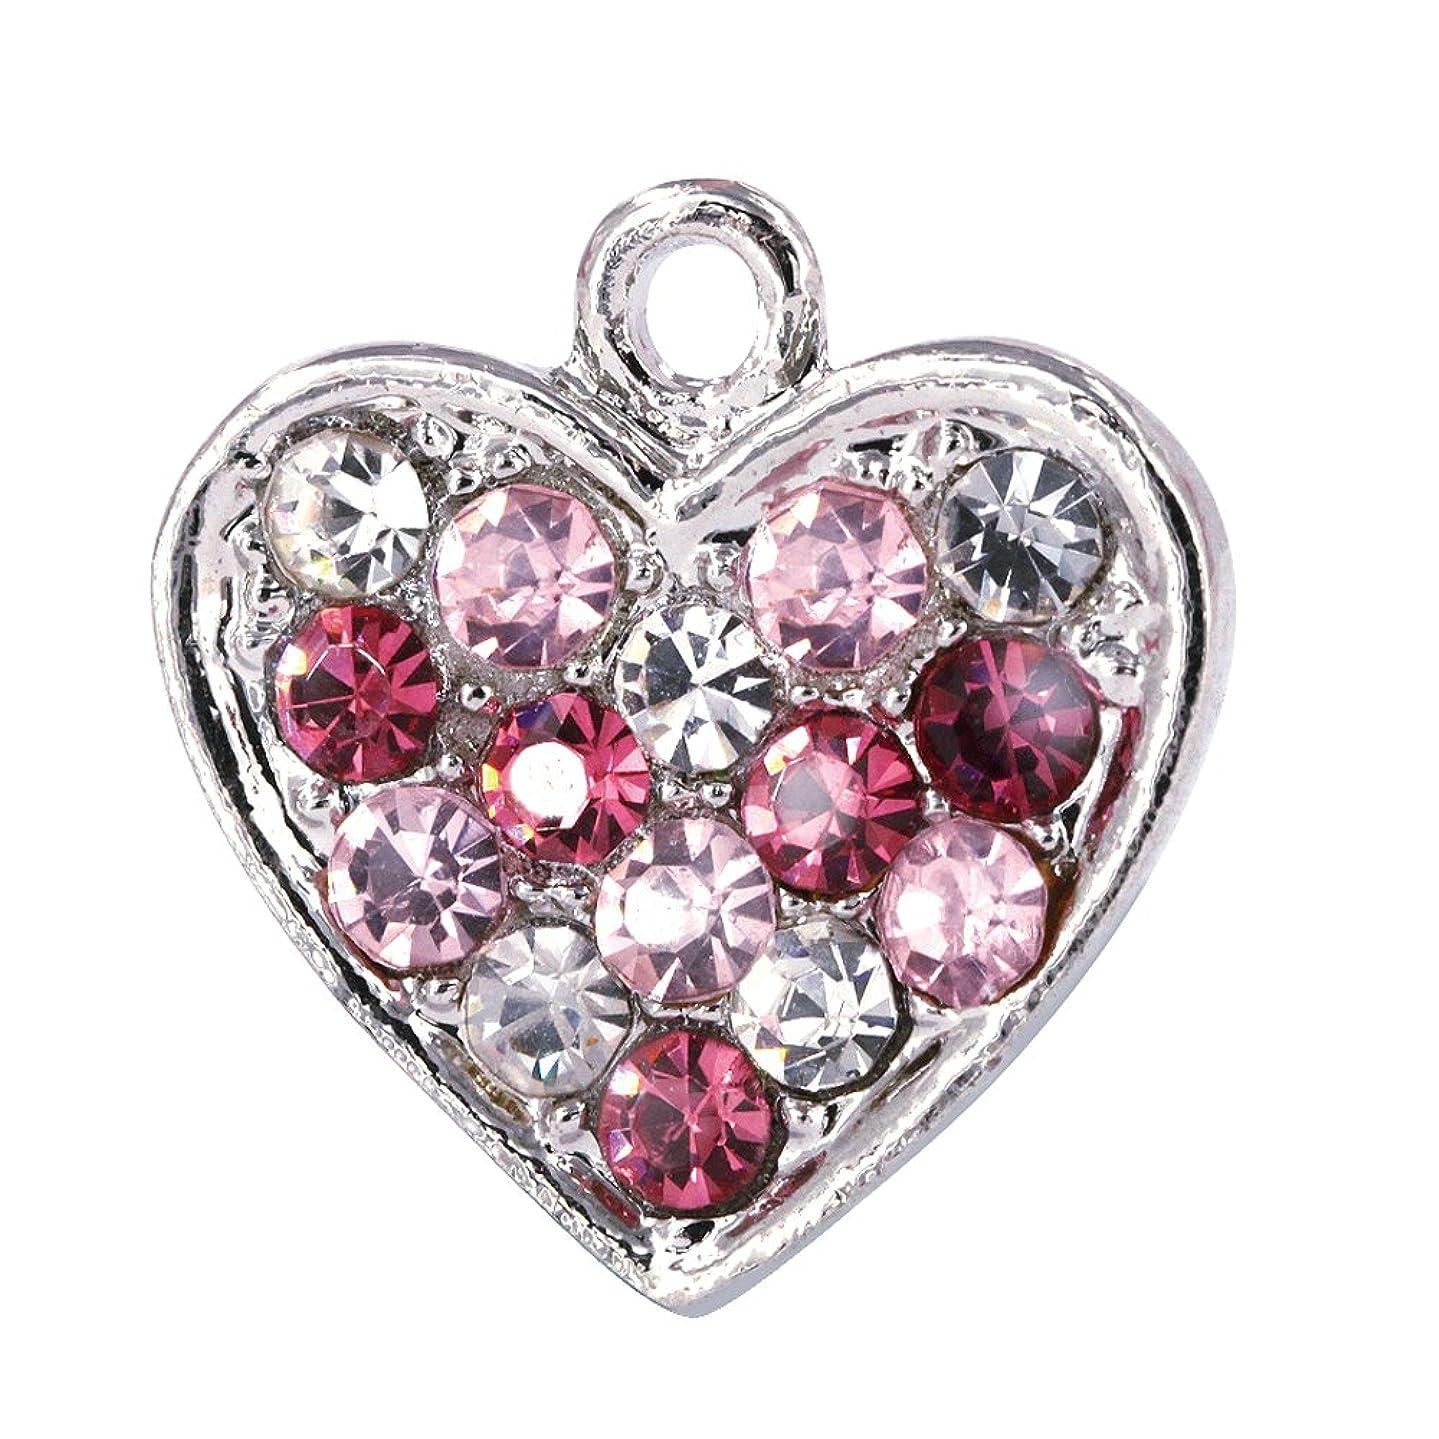 Creative DIY Pink Crystal Heart Charms Pendants Wholesale (Set of 3) MH270